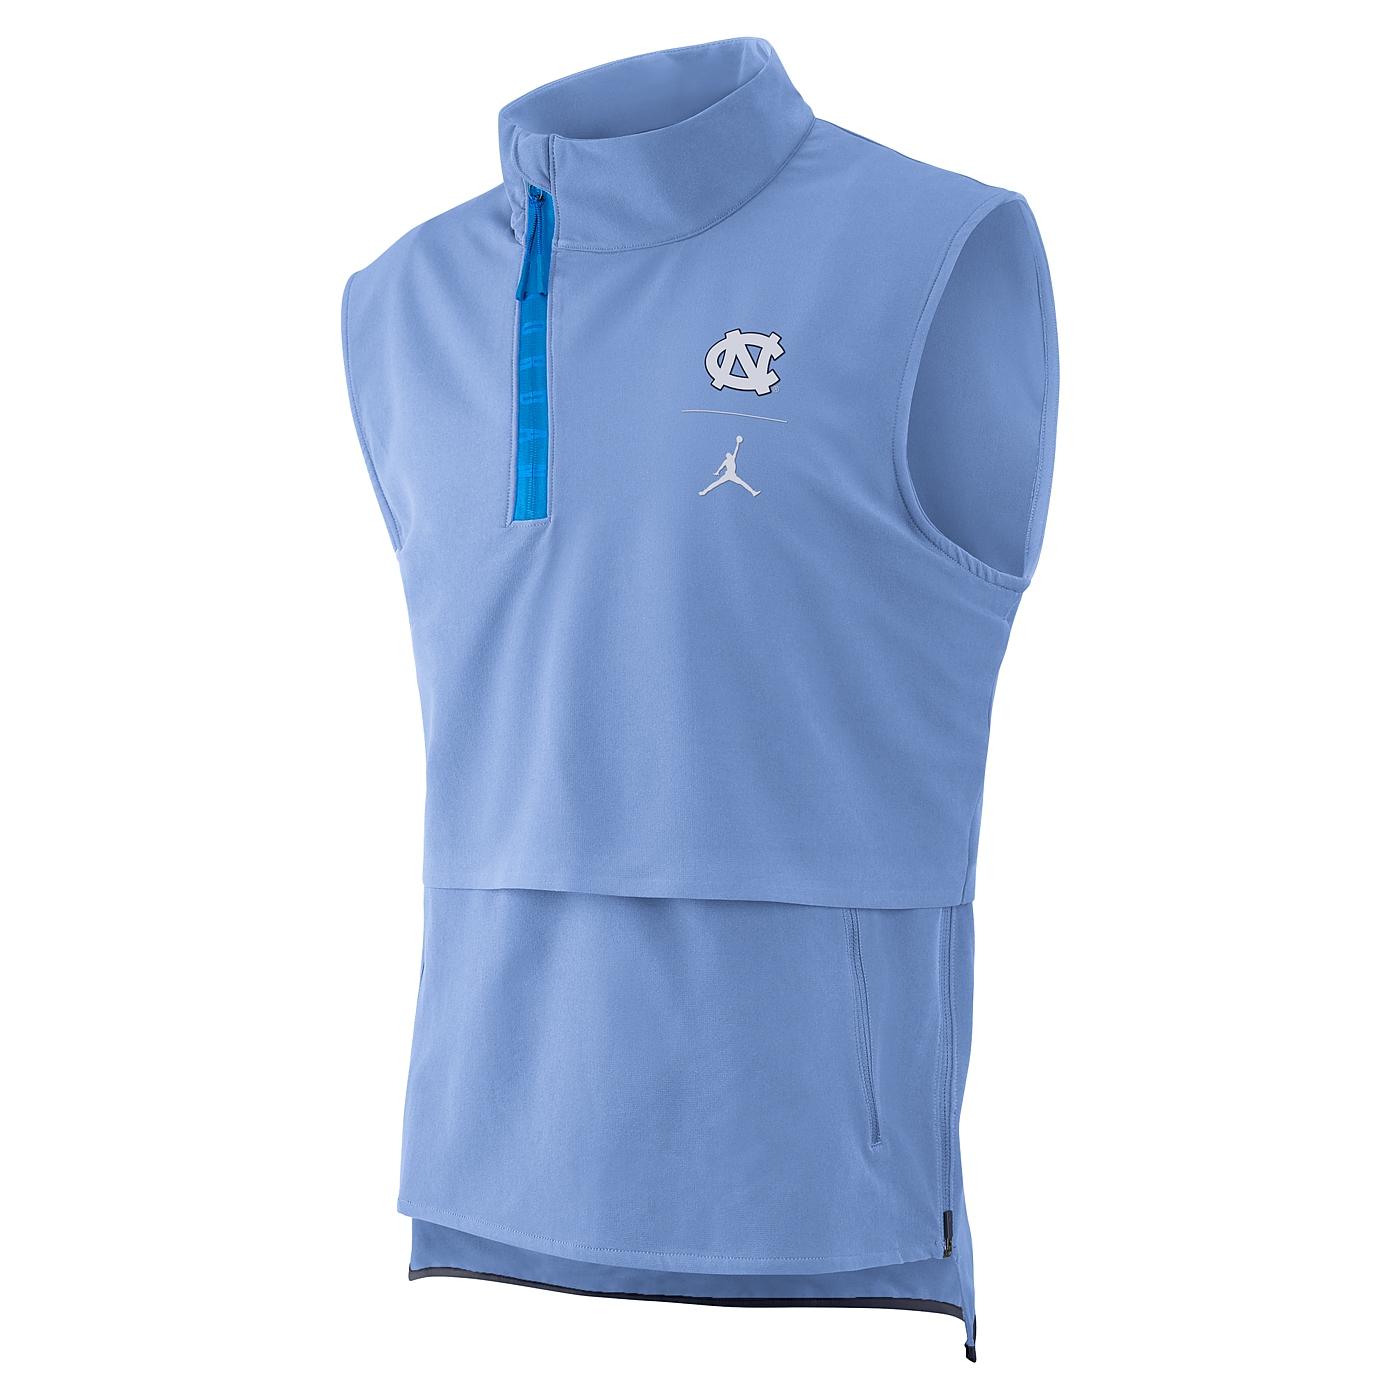 97fdeb4faa89 Johnny T-shirt - North Carolina Tar Heels - Nike Jumpman 1 4-Zip Jordan  Sleeveless Jacket (CB) by Nike